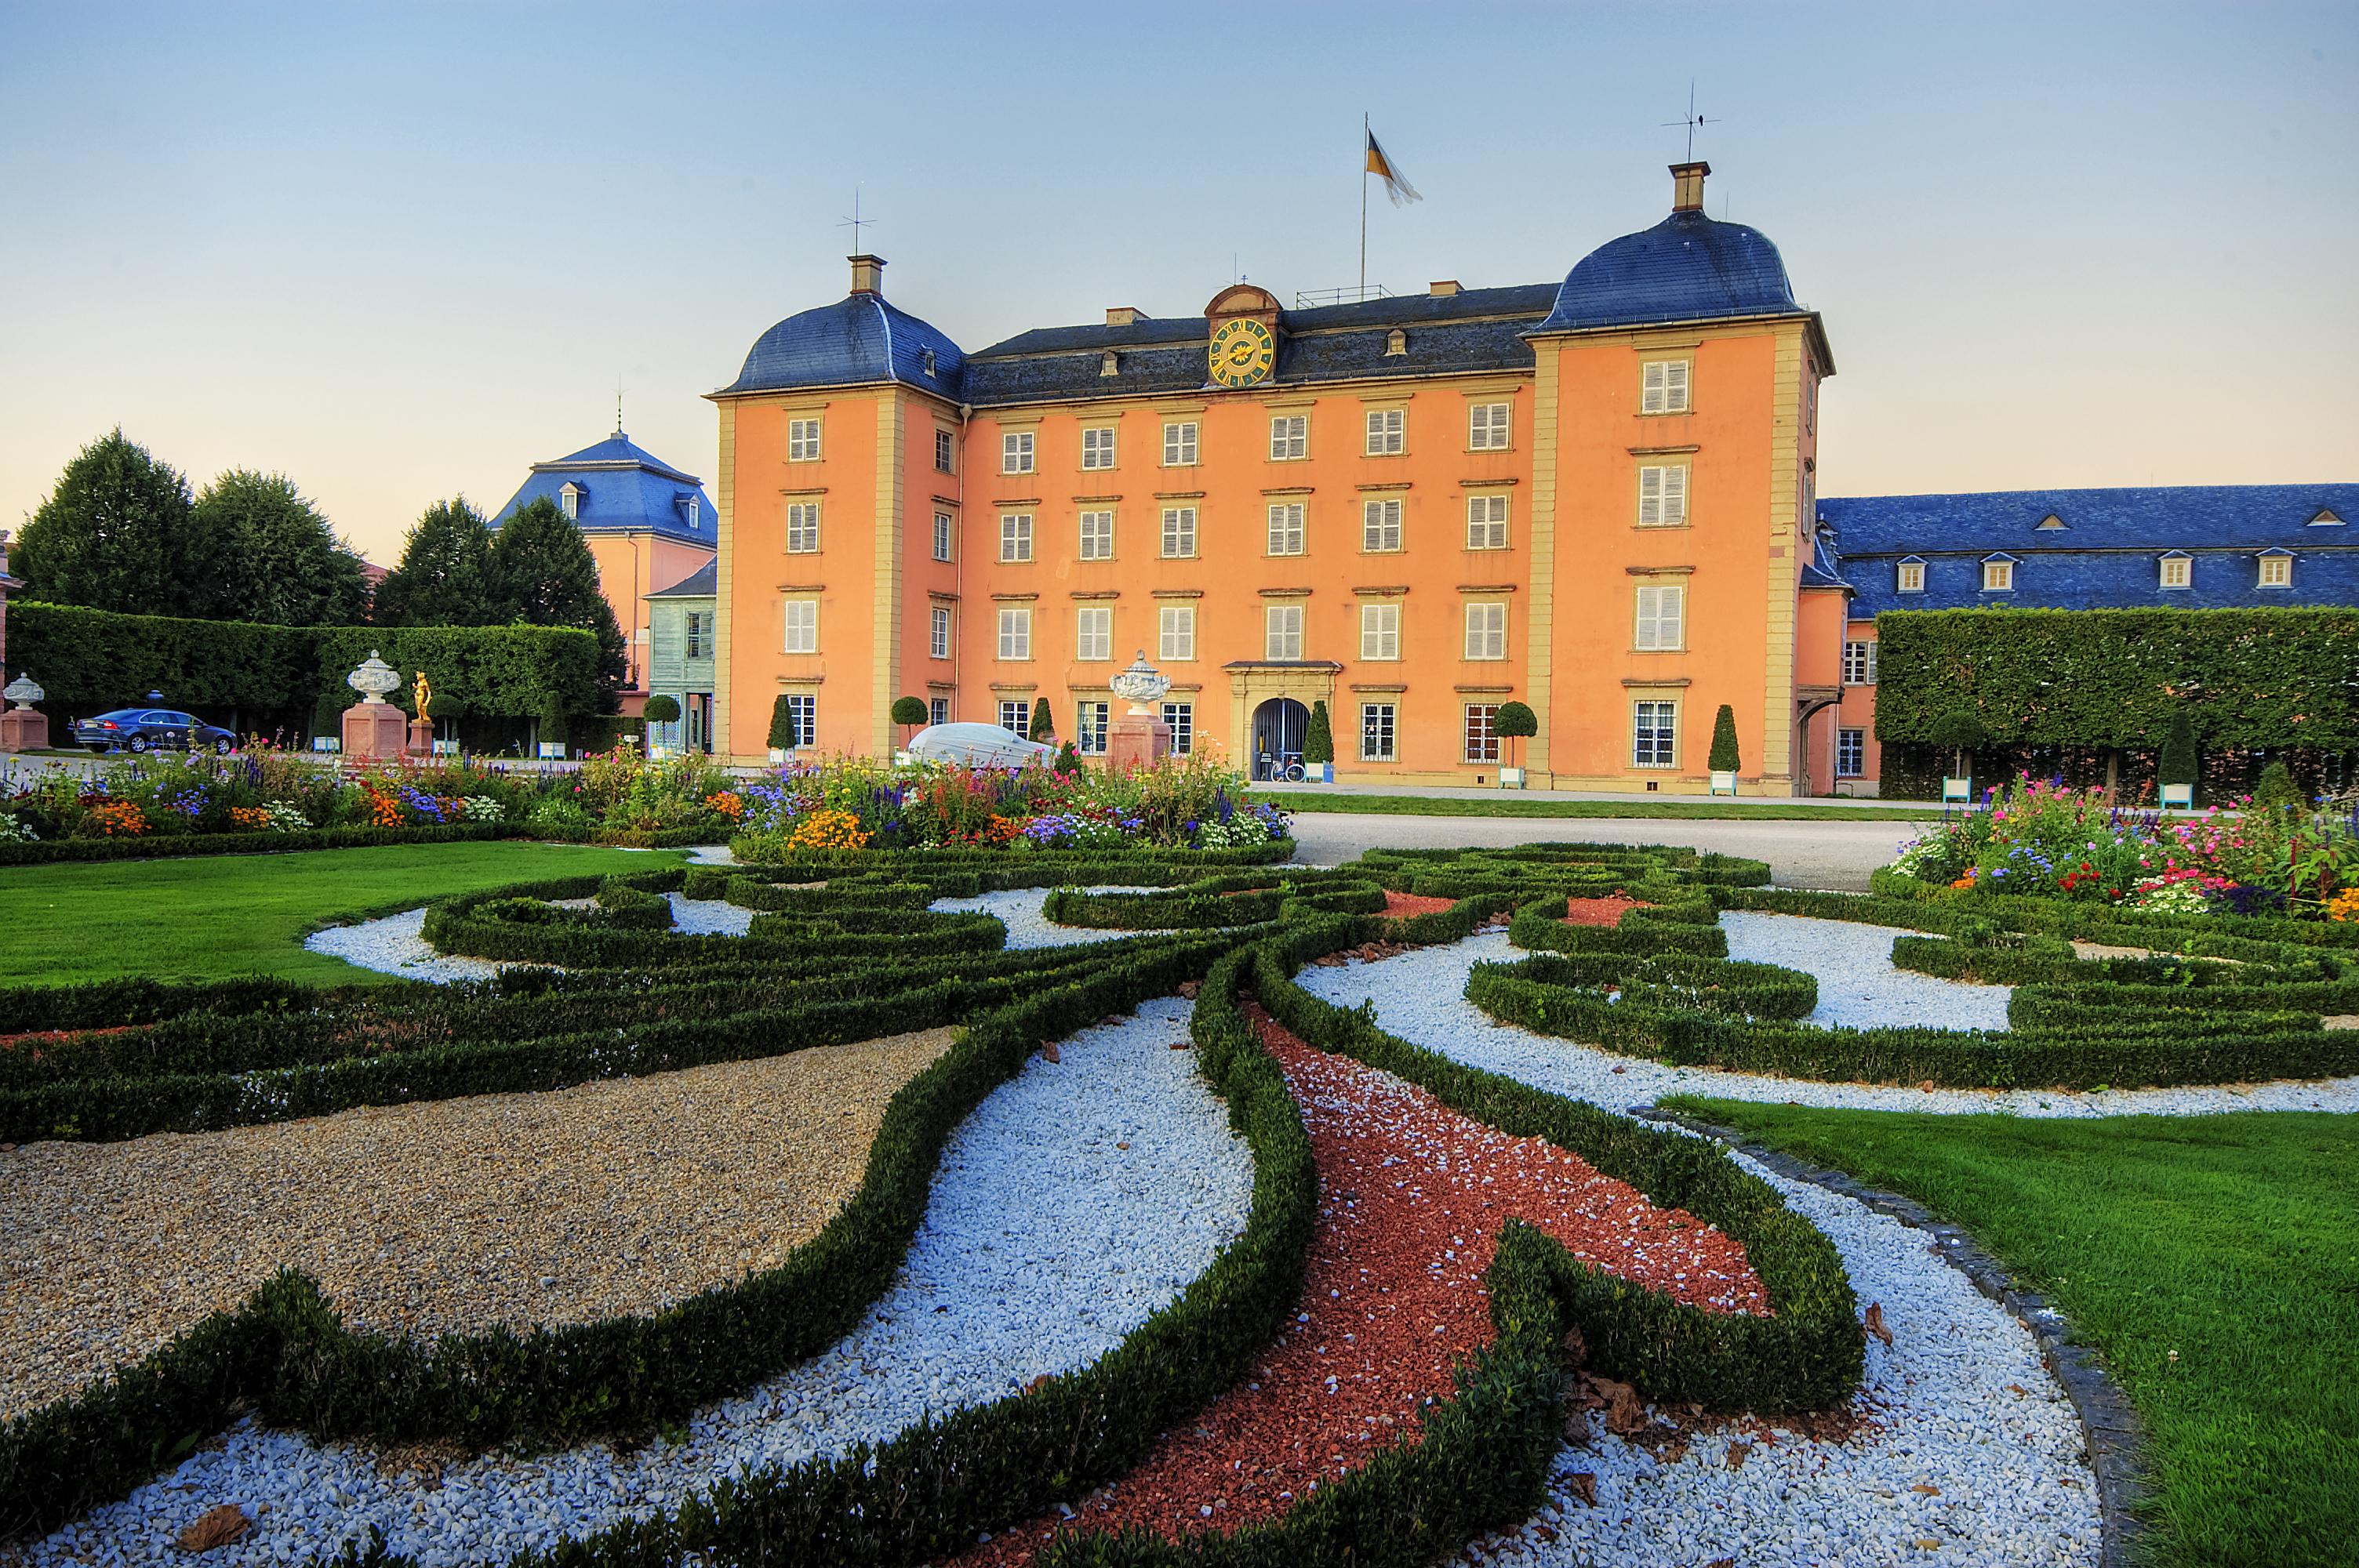 House Desighn File Schlossgarten Schwetzingen Jpg Wikimedia Commons